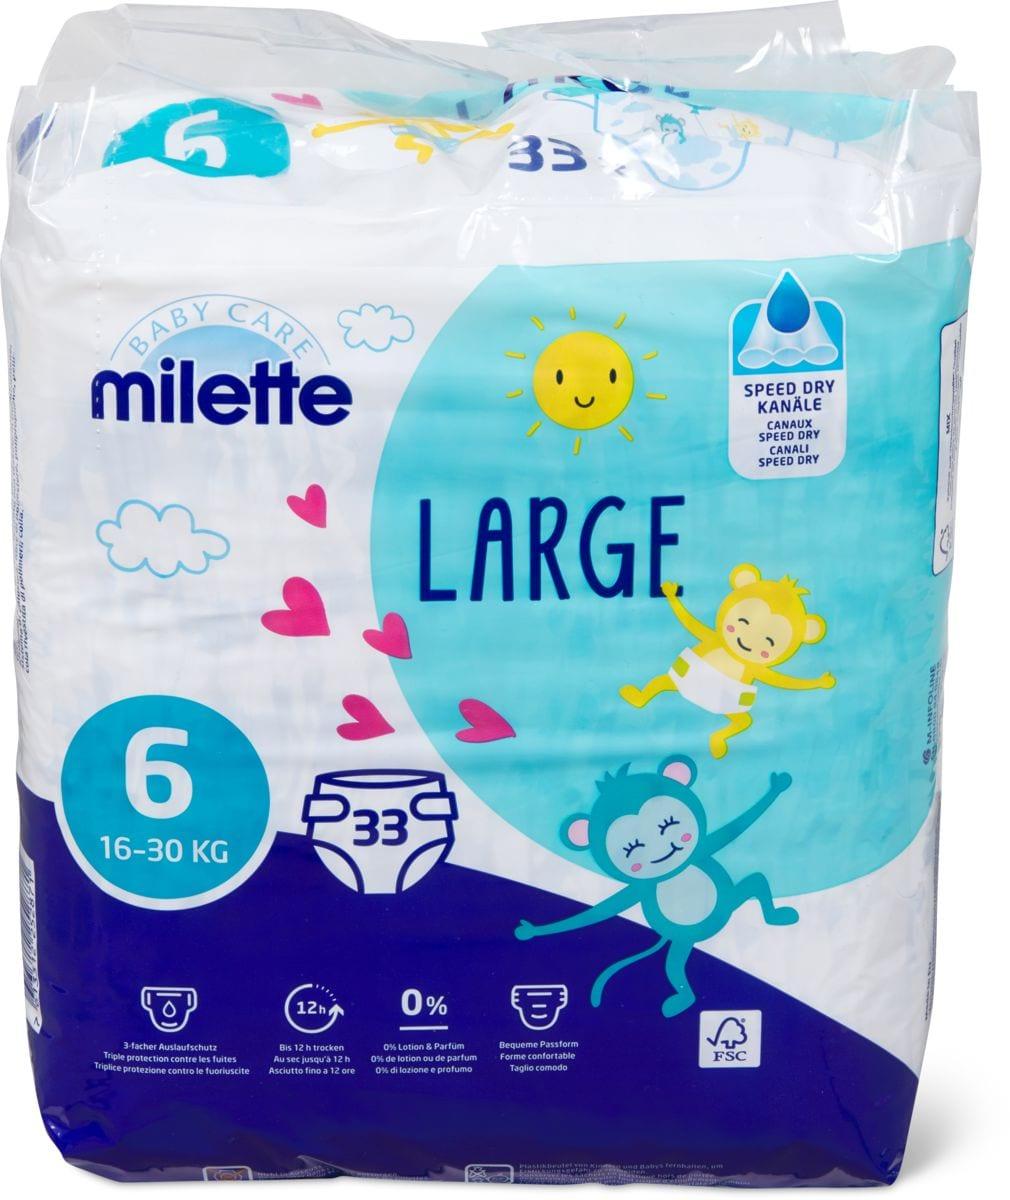 Milette Large 6, 16-30 kg